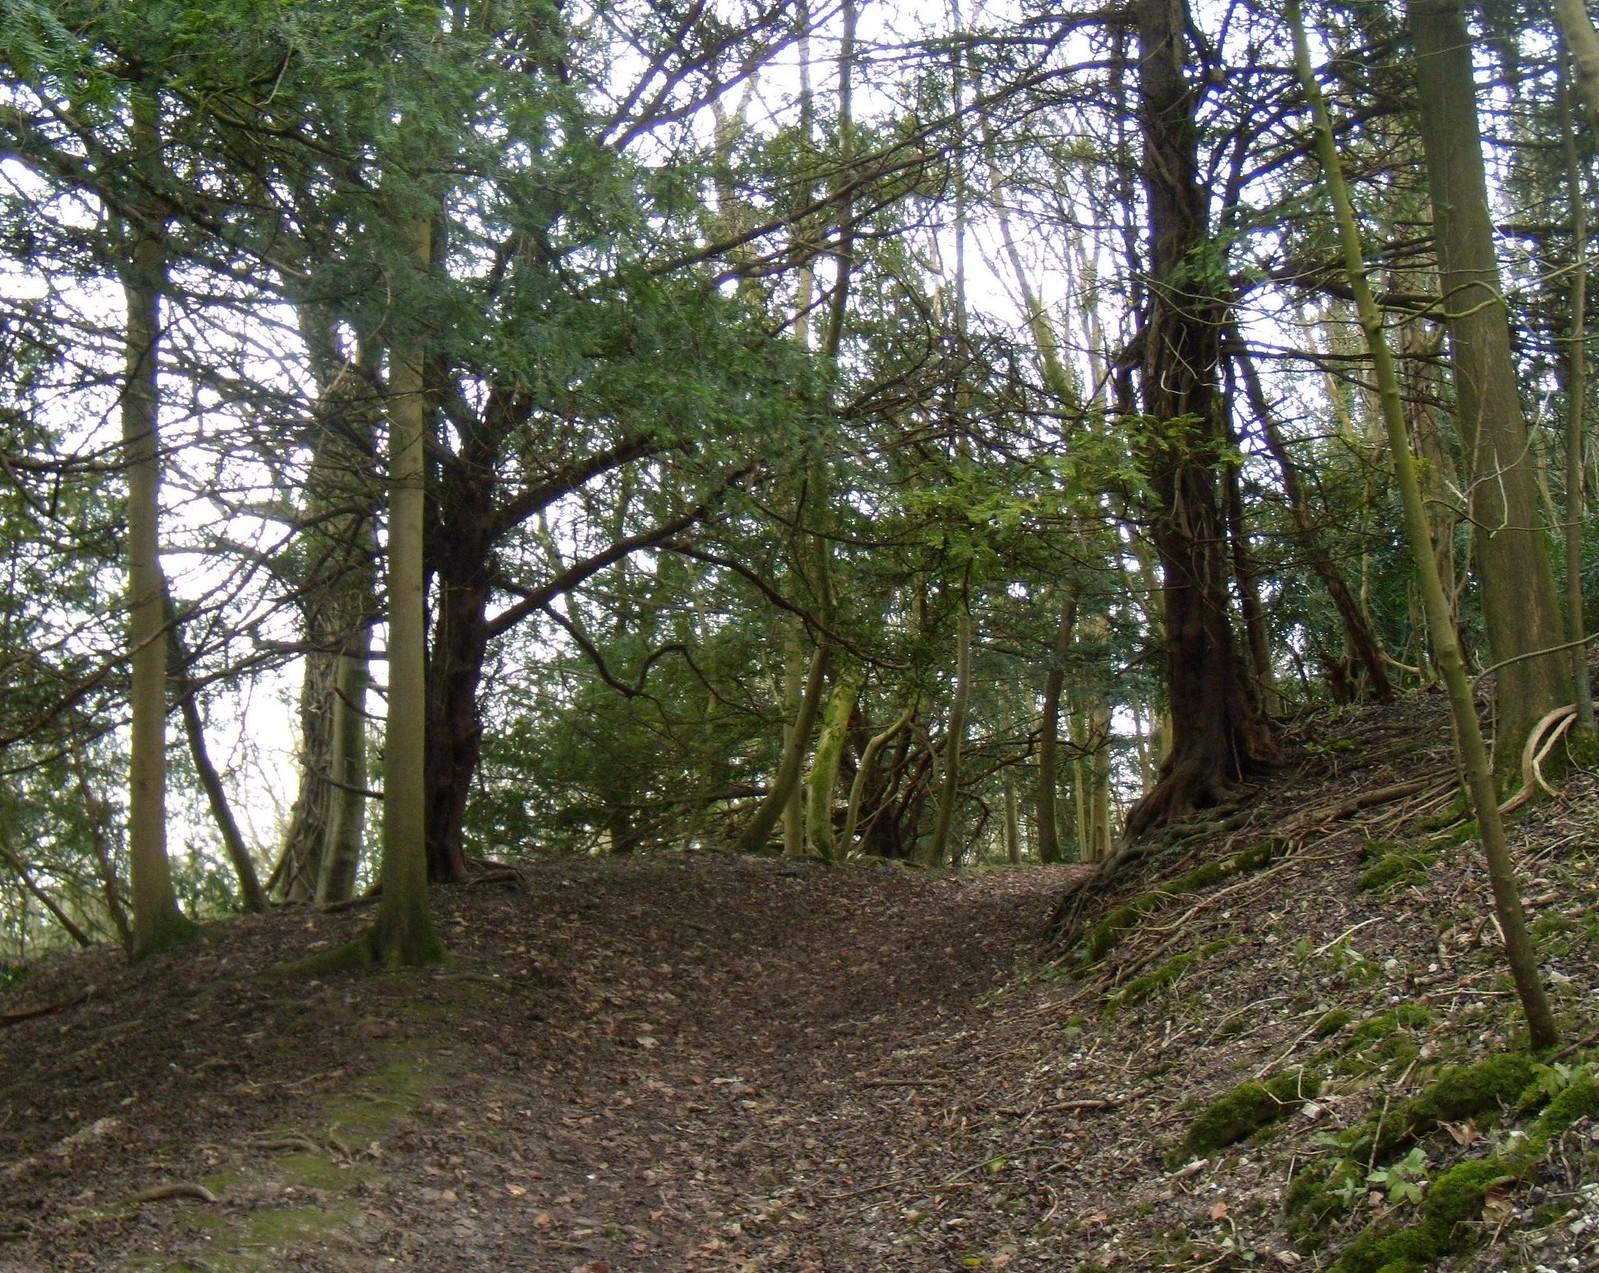 Path Arundel Circular